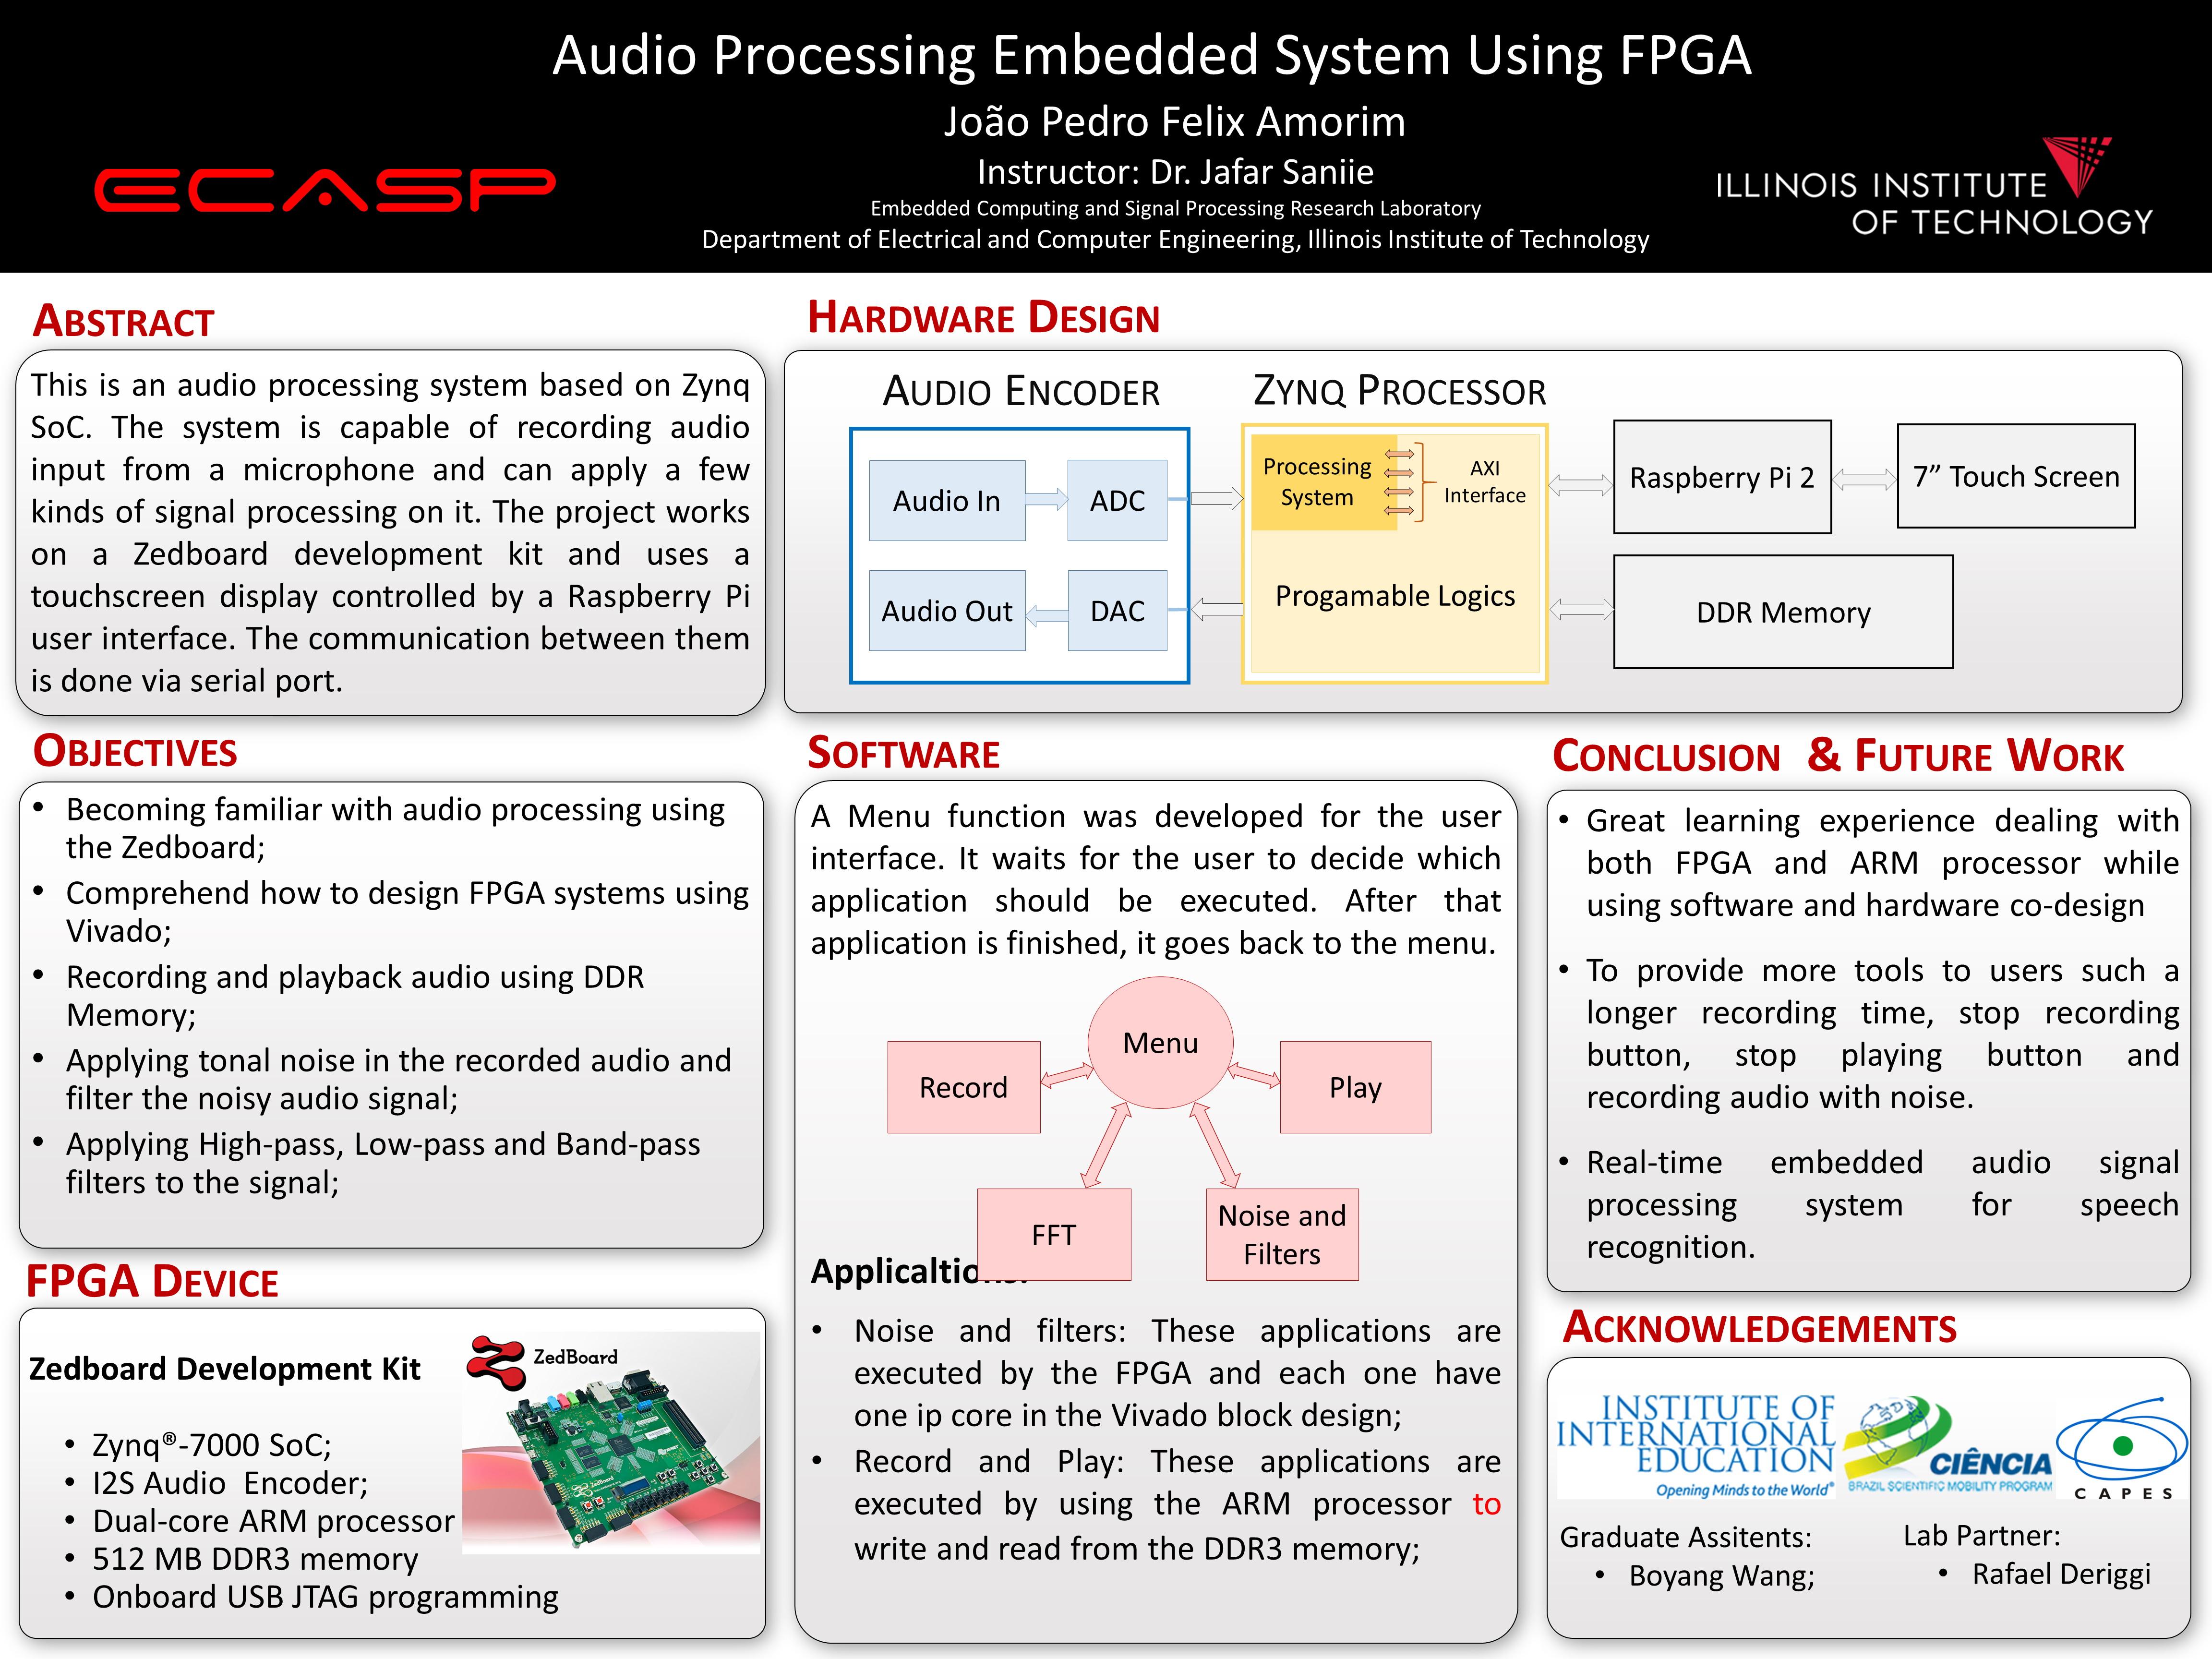 bsmp2016_audio1.jpg